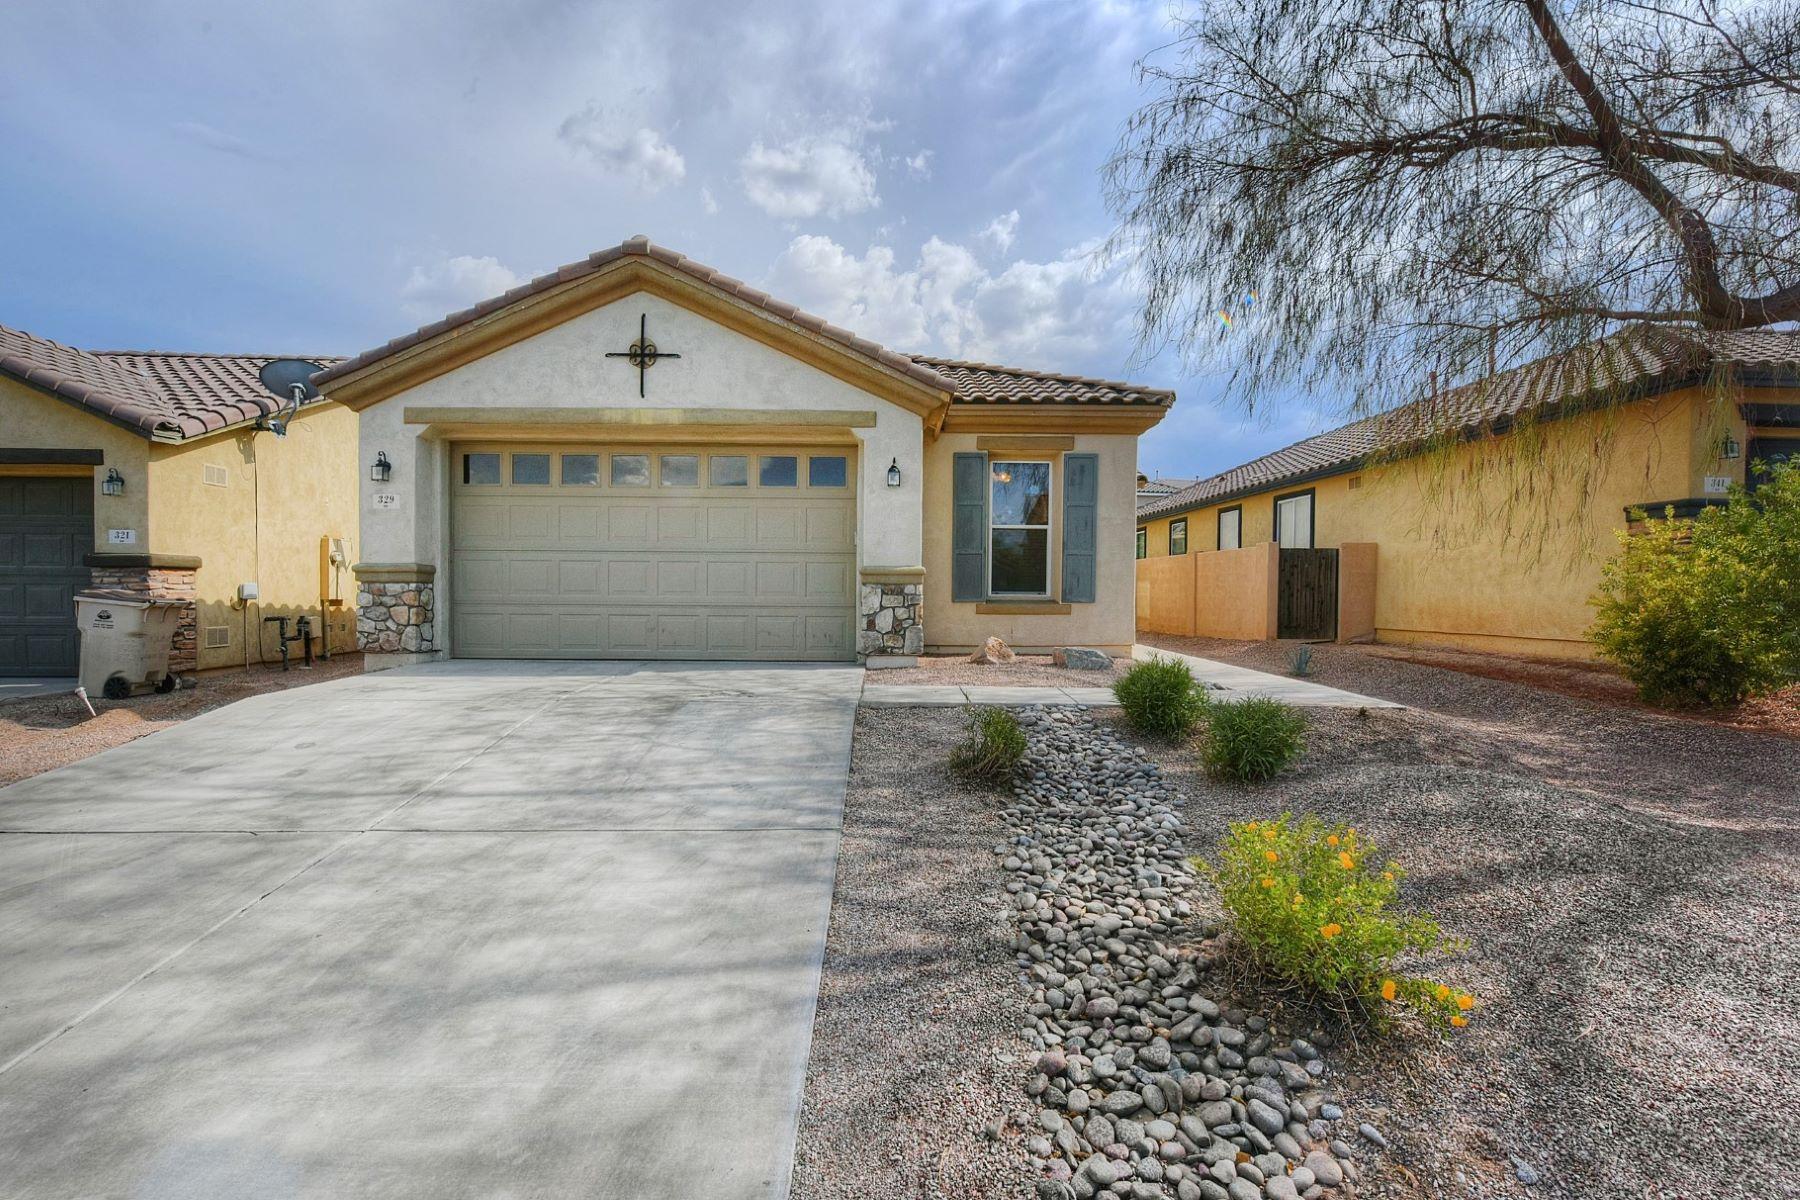 Single Family Homes for Sale at Three Bedroom Two Bath Plus Den 329 W Vuelta Friso Sahuarita, Arizona 85629 United States